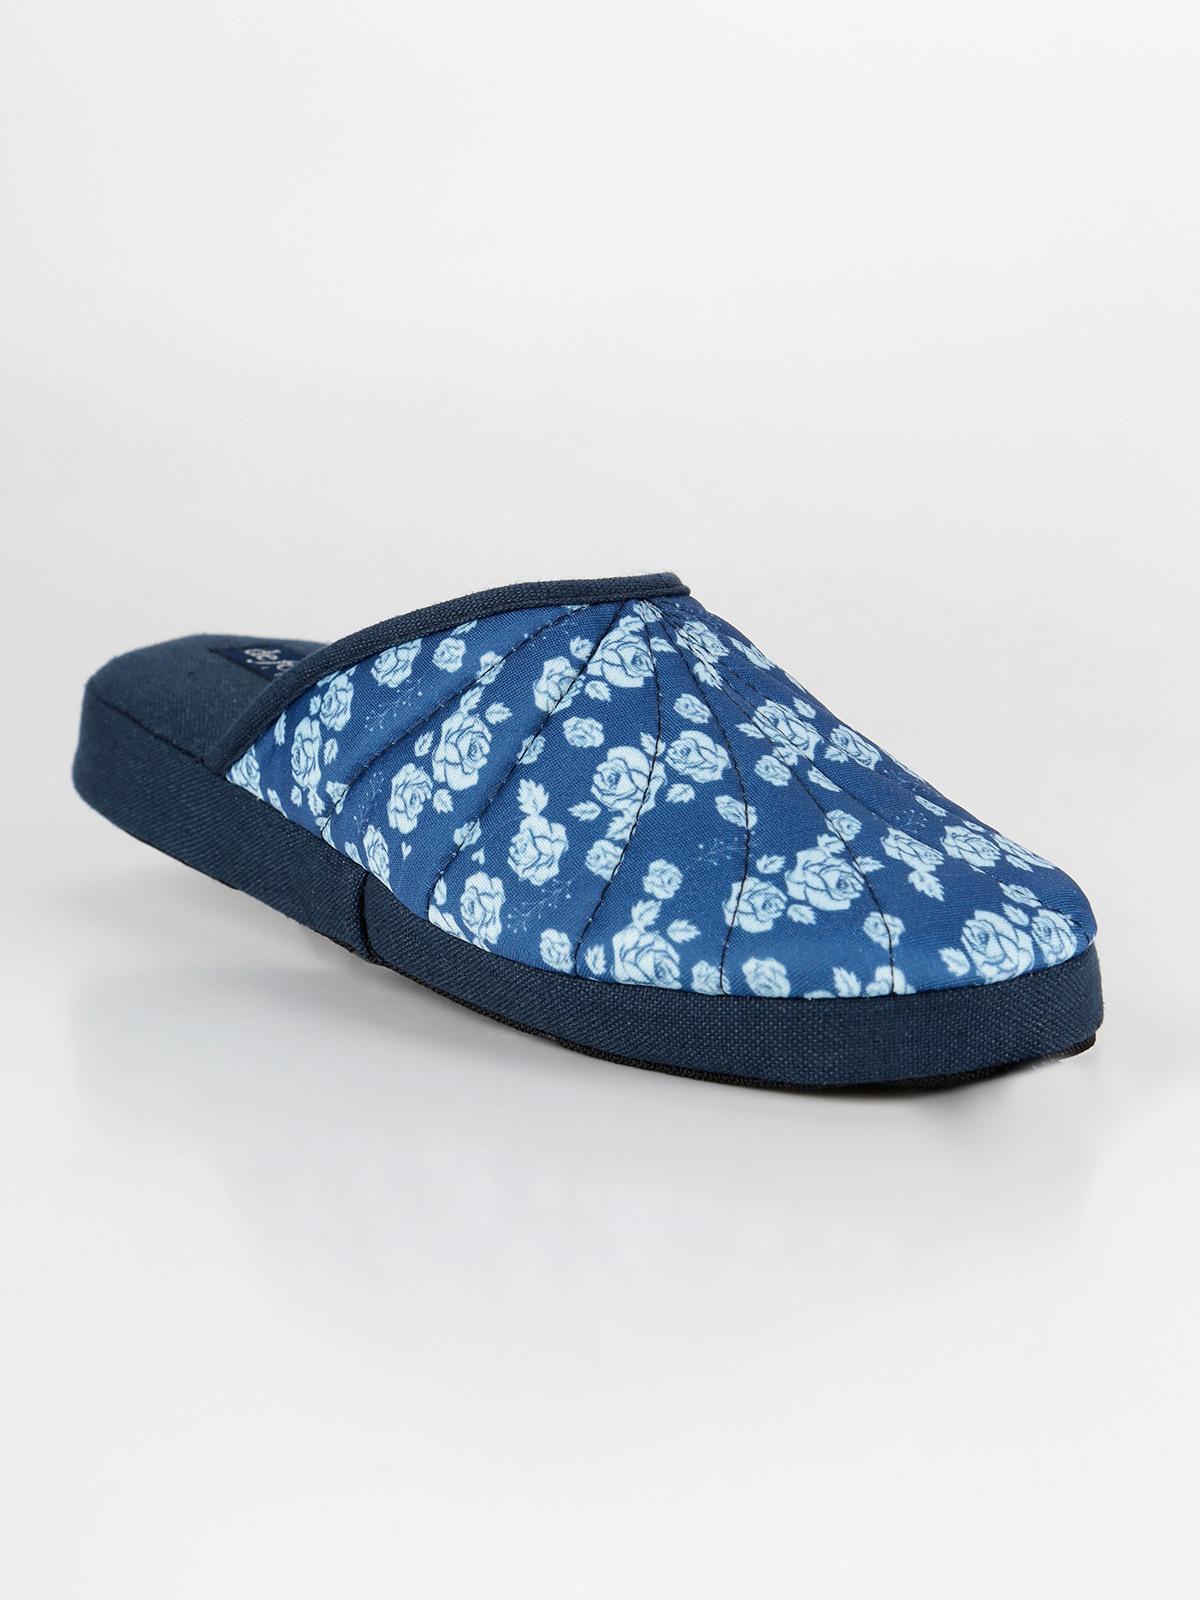 Pantofole in tessuto con stampa fiori defonseca | MecShopping